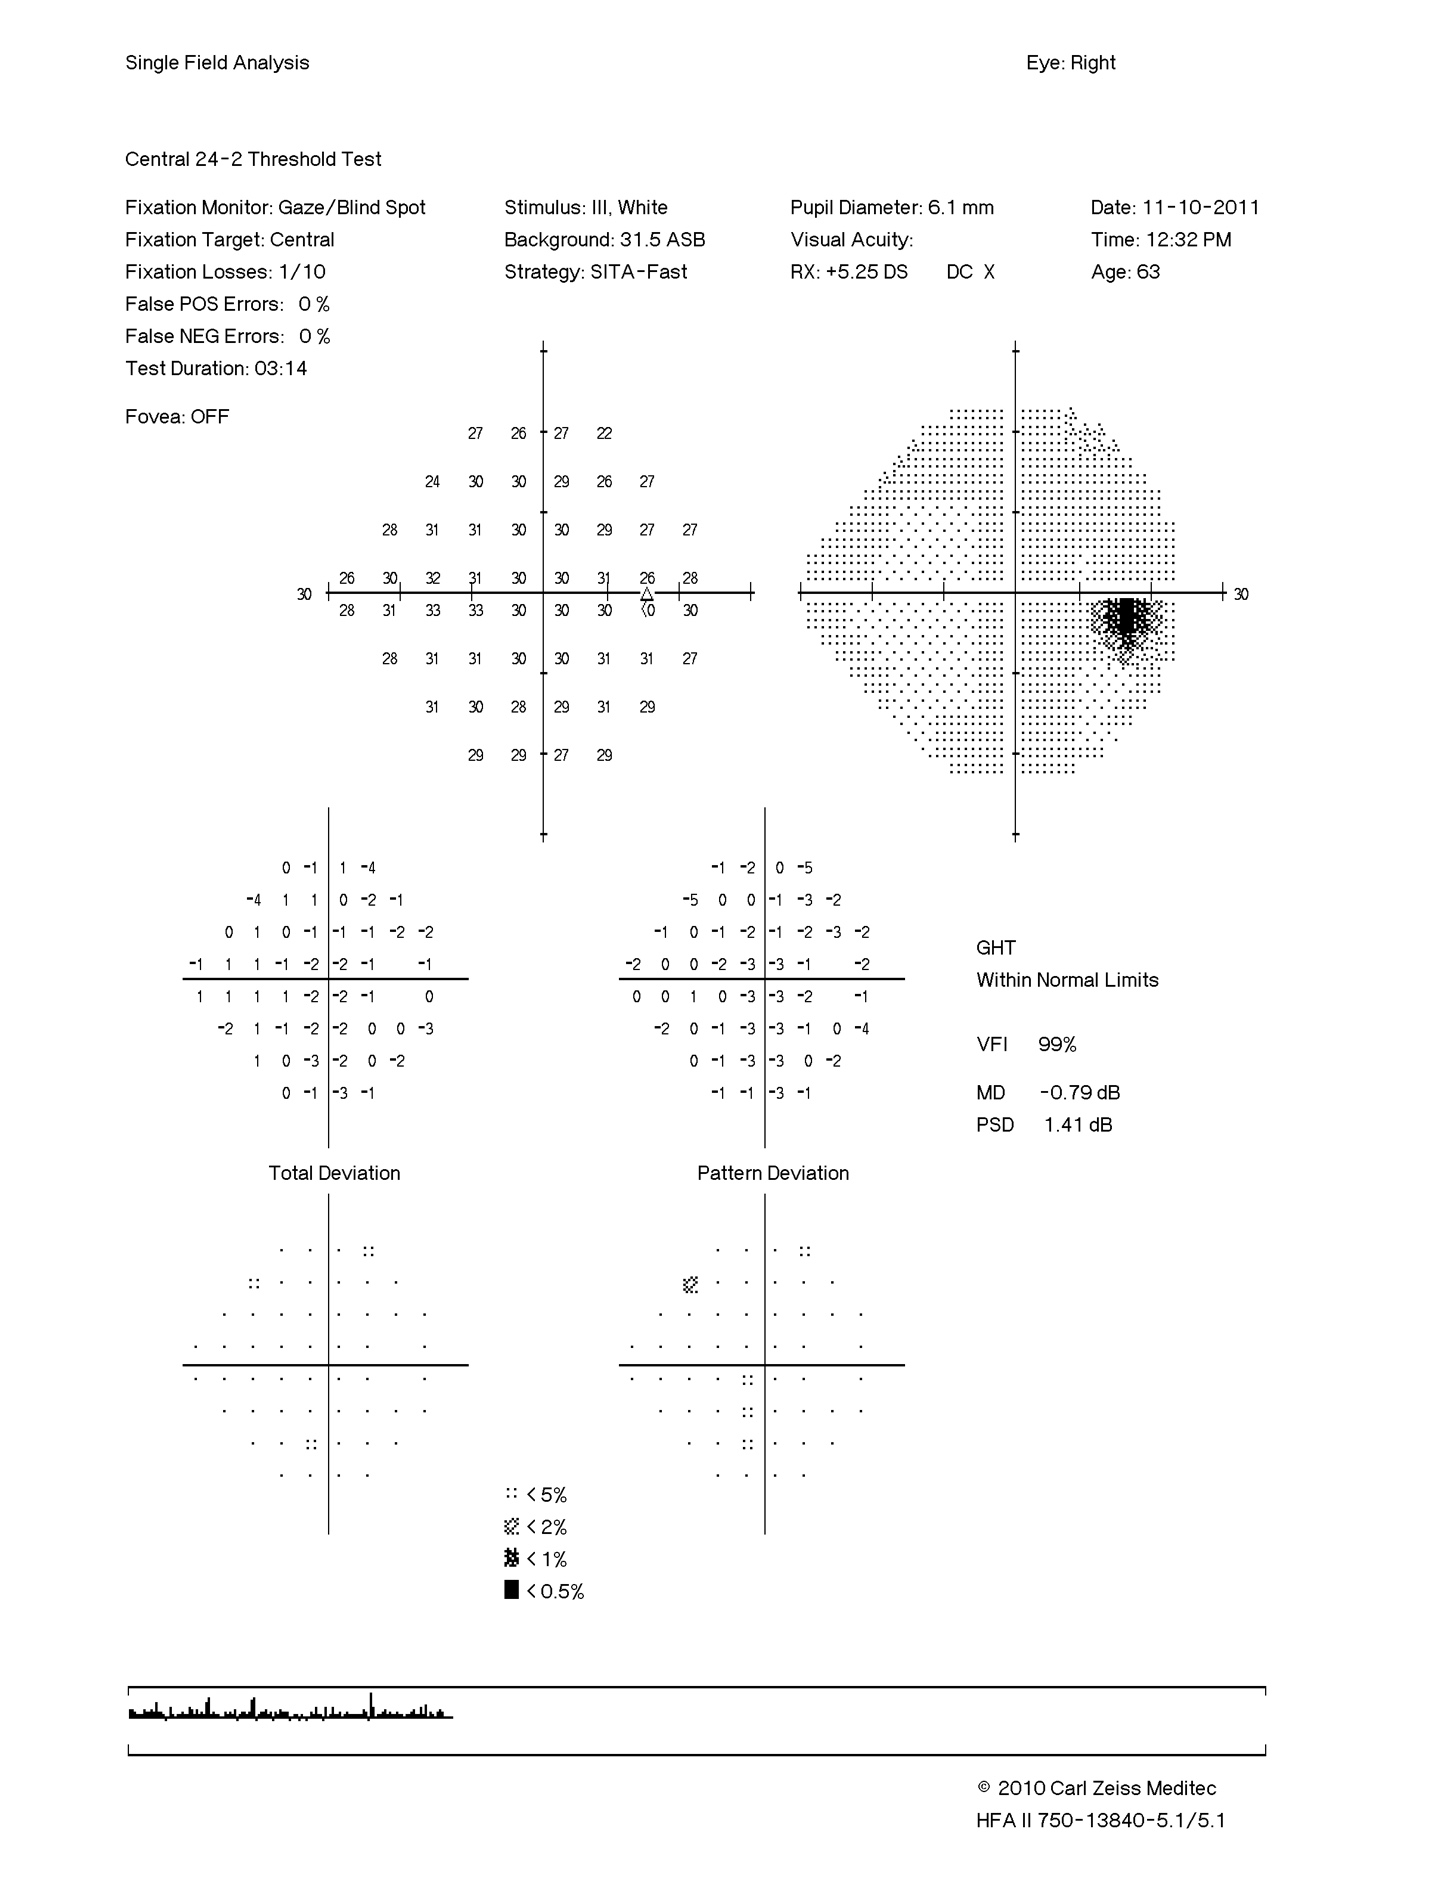 Vitamin B12 Deficiency Optic Neuropathy a Teaching Case Report